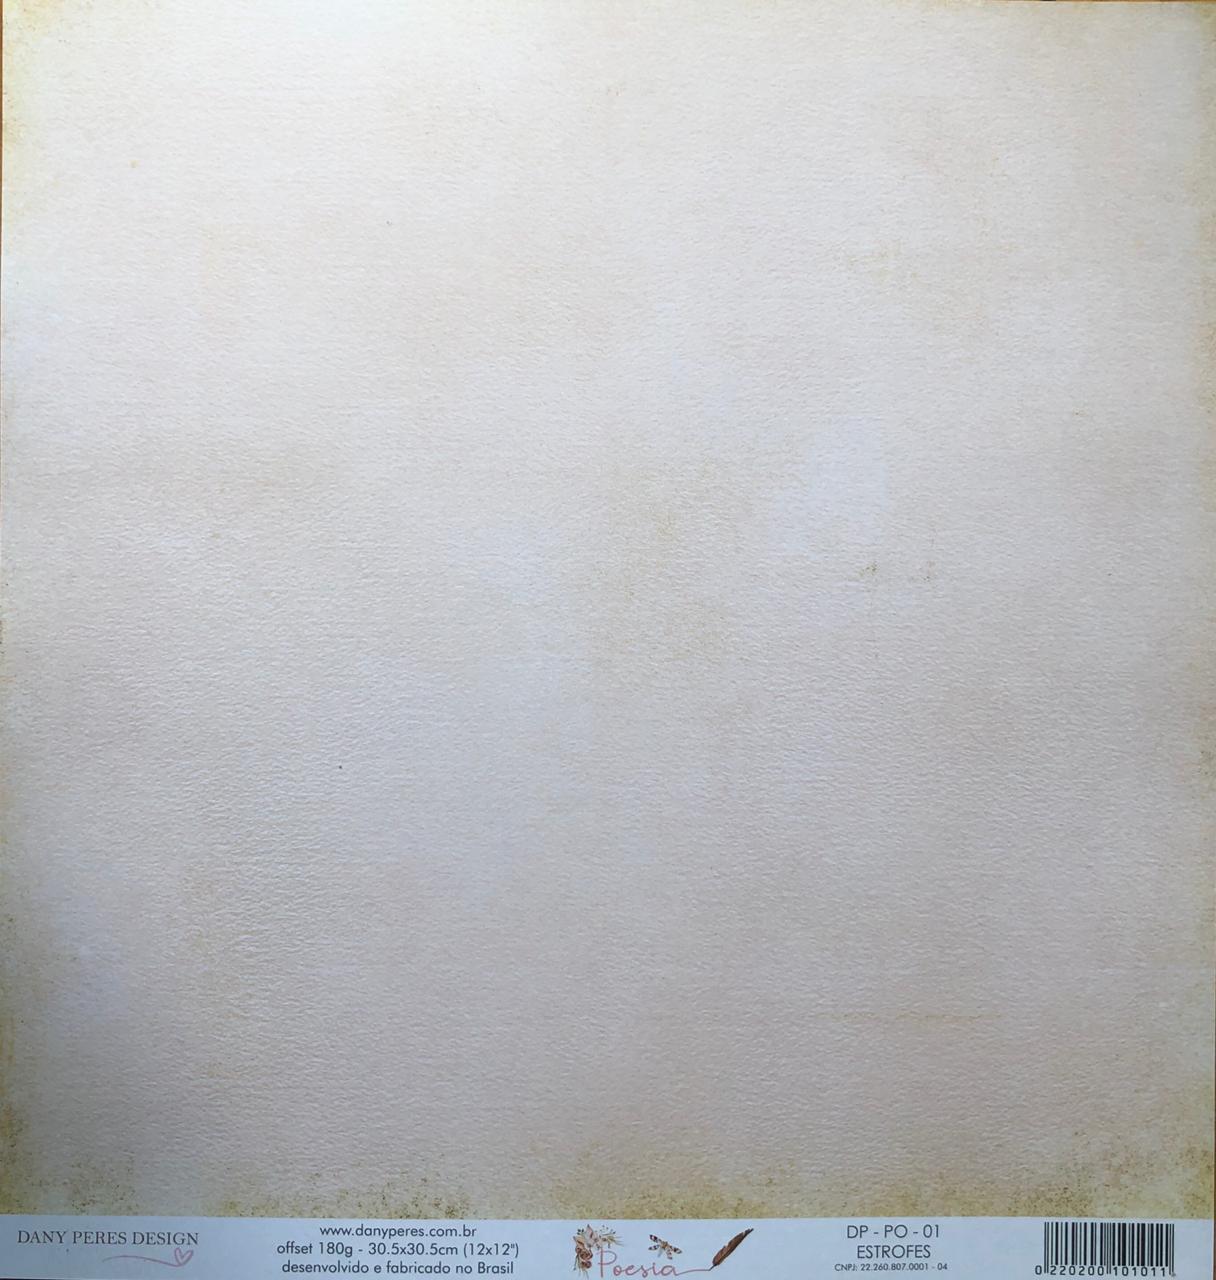 Papel Scrap - Estrofes - Coleção Poesia - Dany Peres (DP-PO-01)